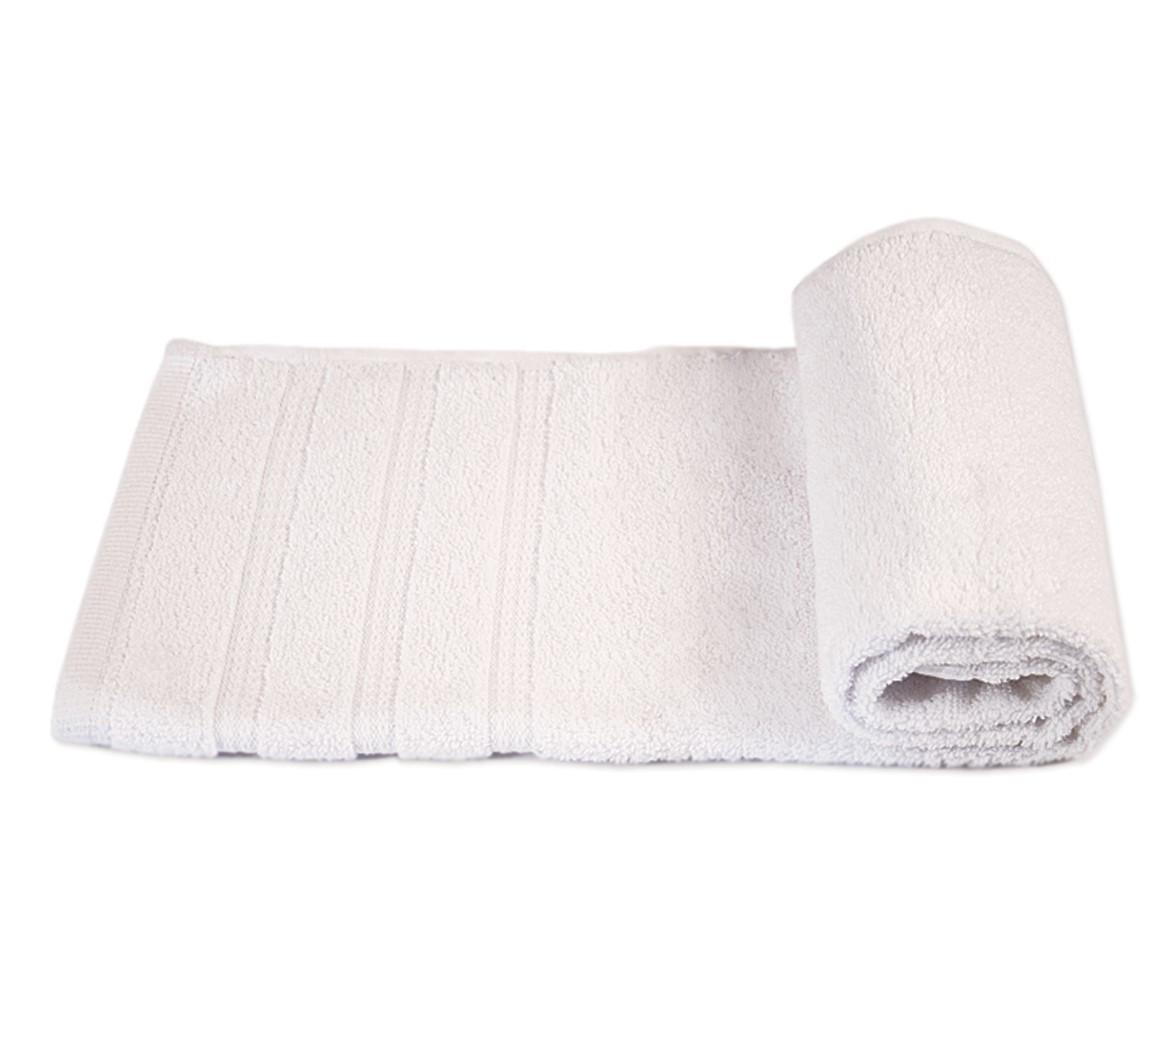 Пушистое махровое полотенце Софт-твист ТМ Ярослав 100х150 см